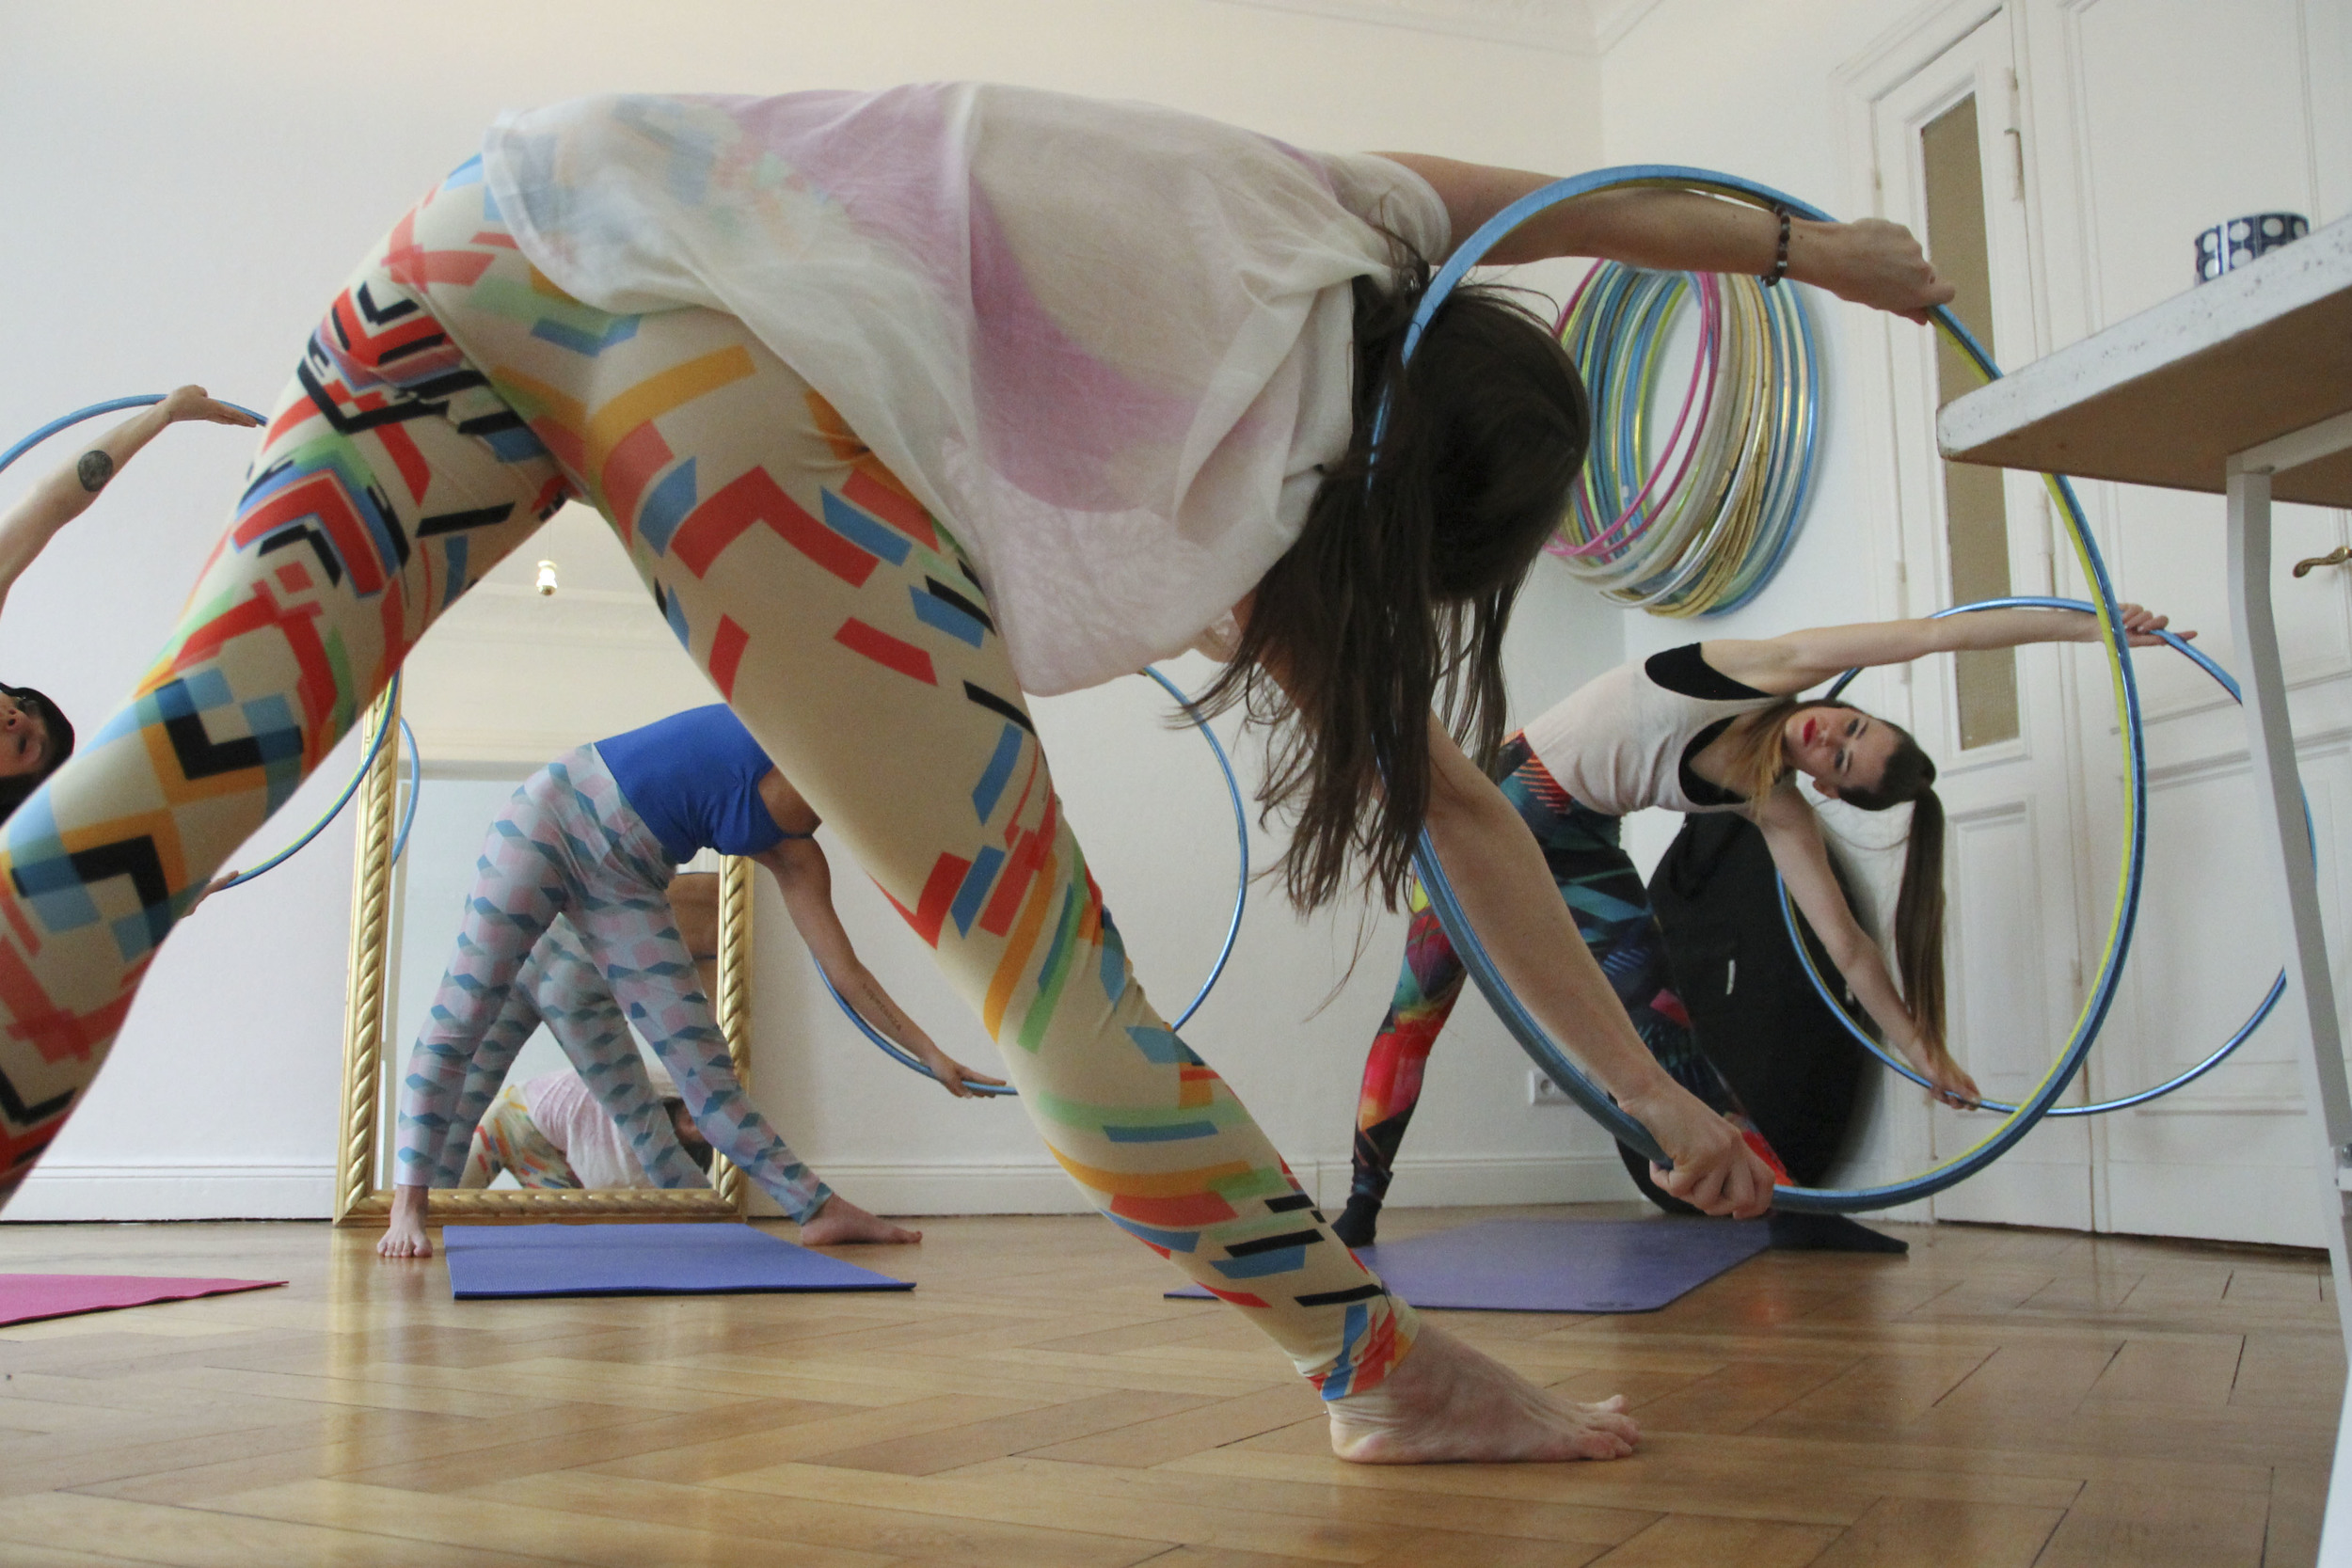 hoop yoga rebecca halls berlin1262.jpg